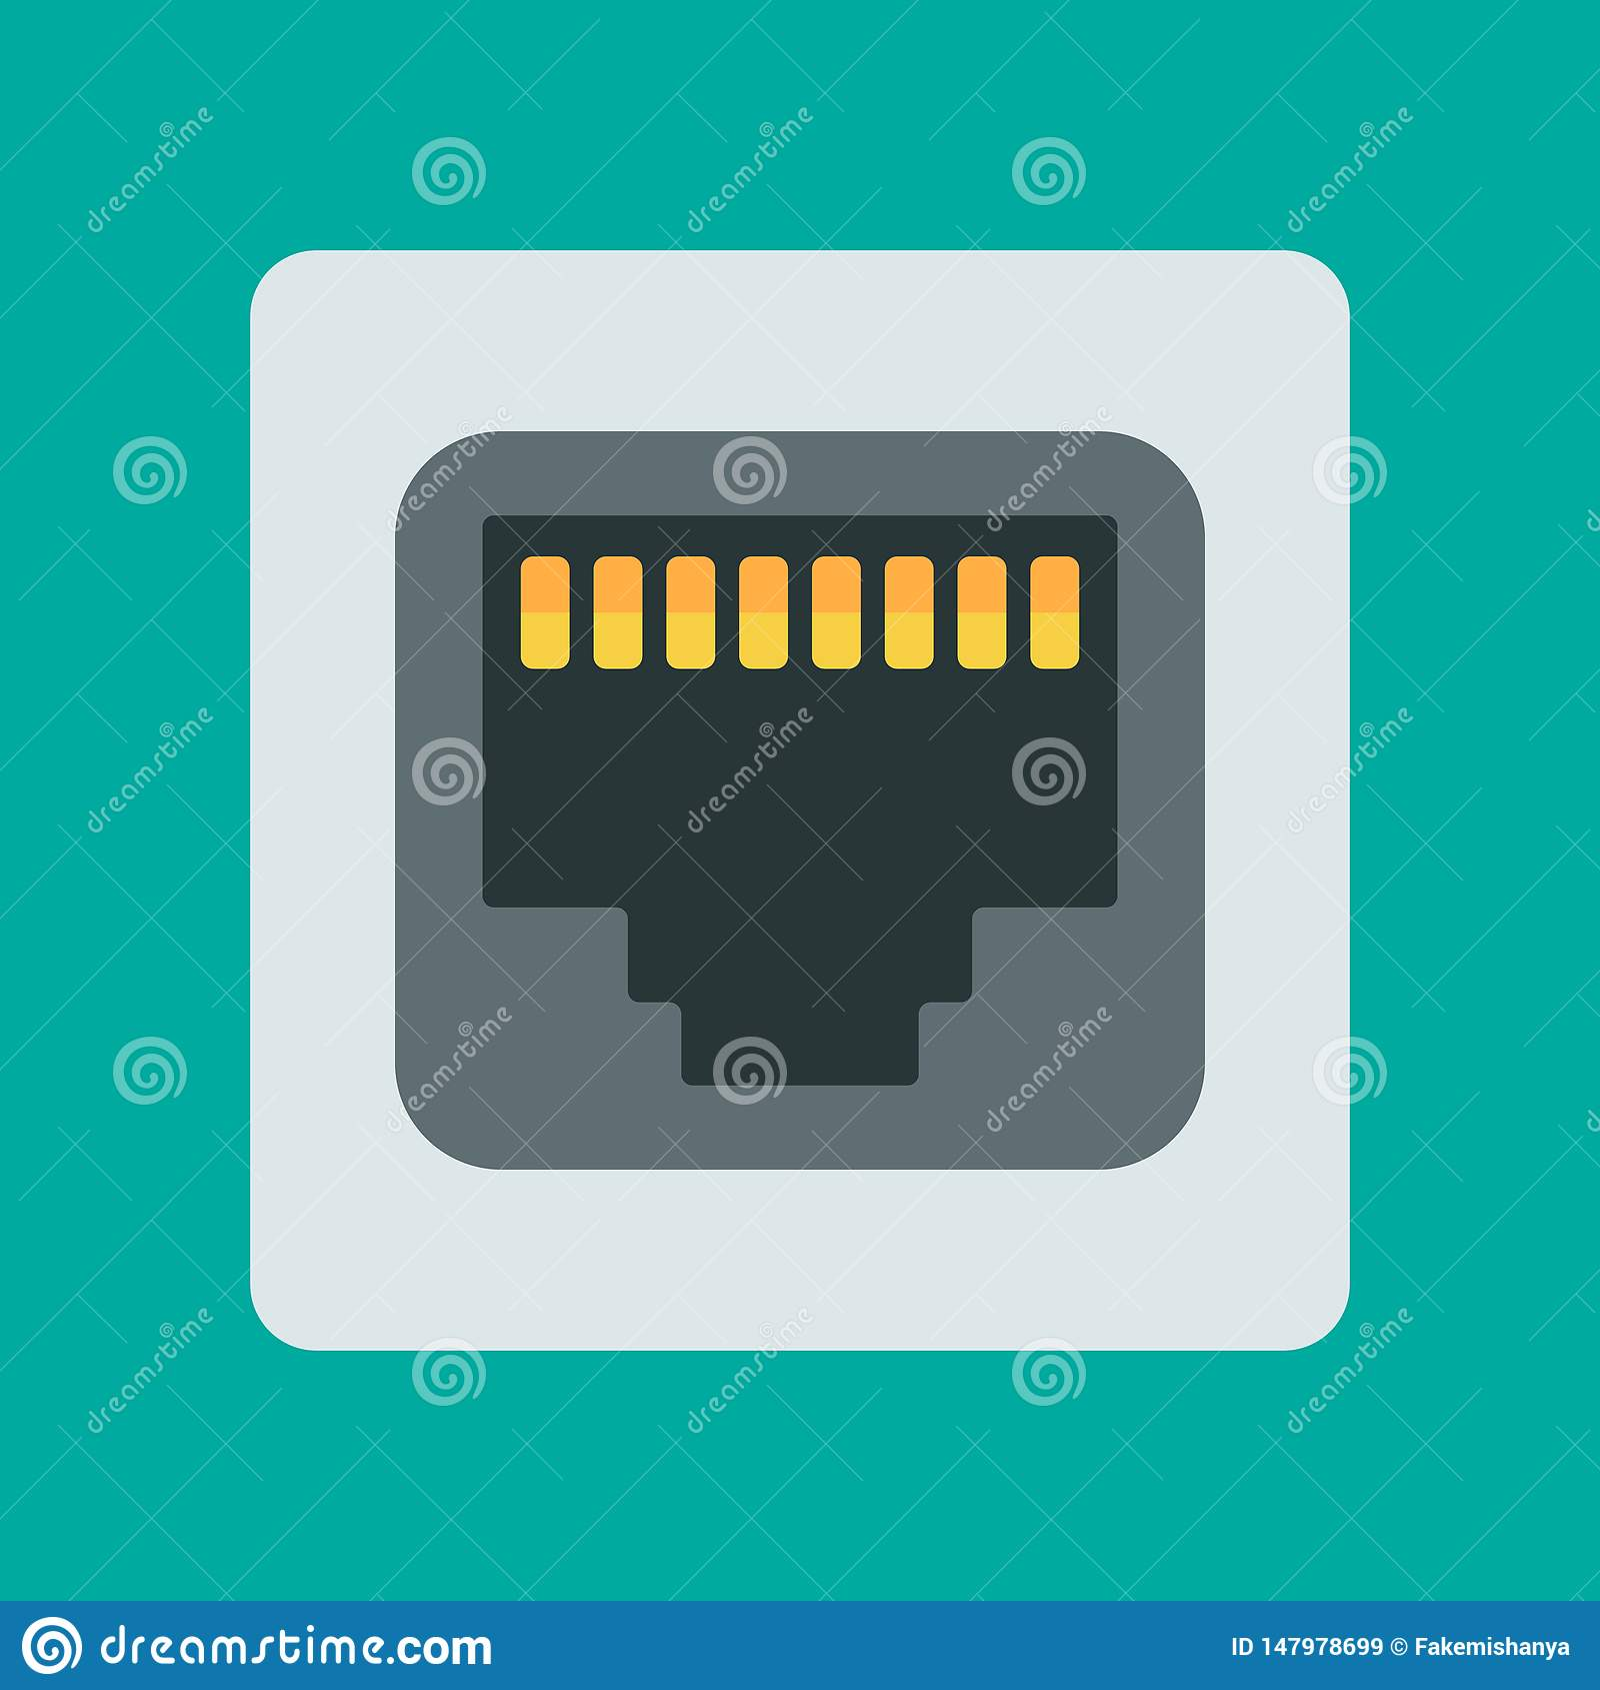 Vector network socket icon. Vector illustration.